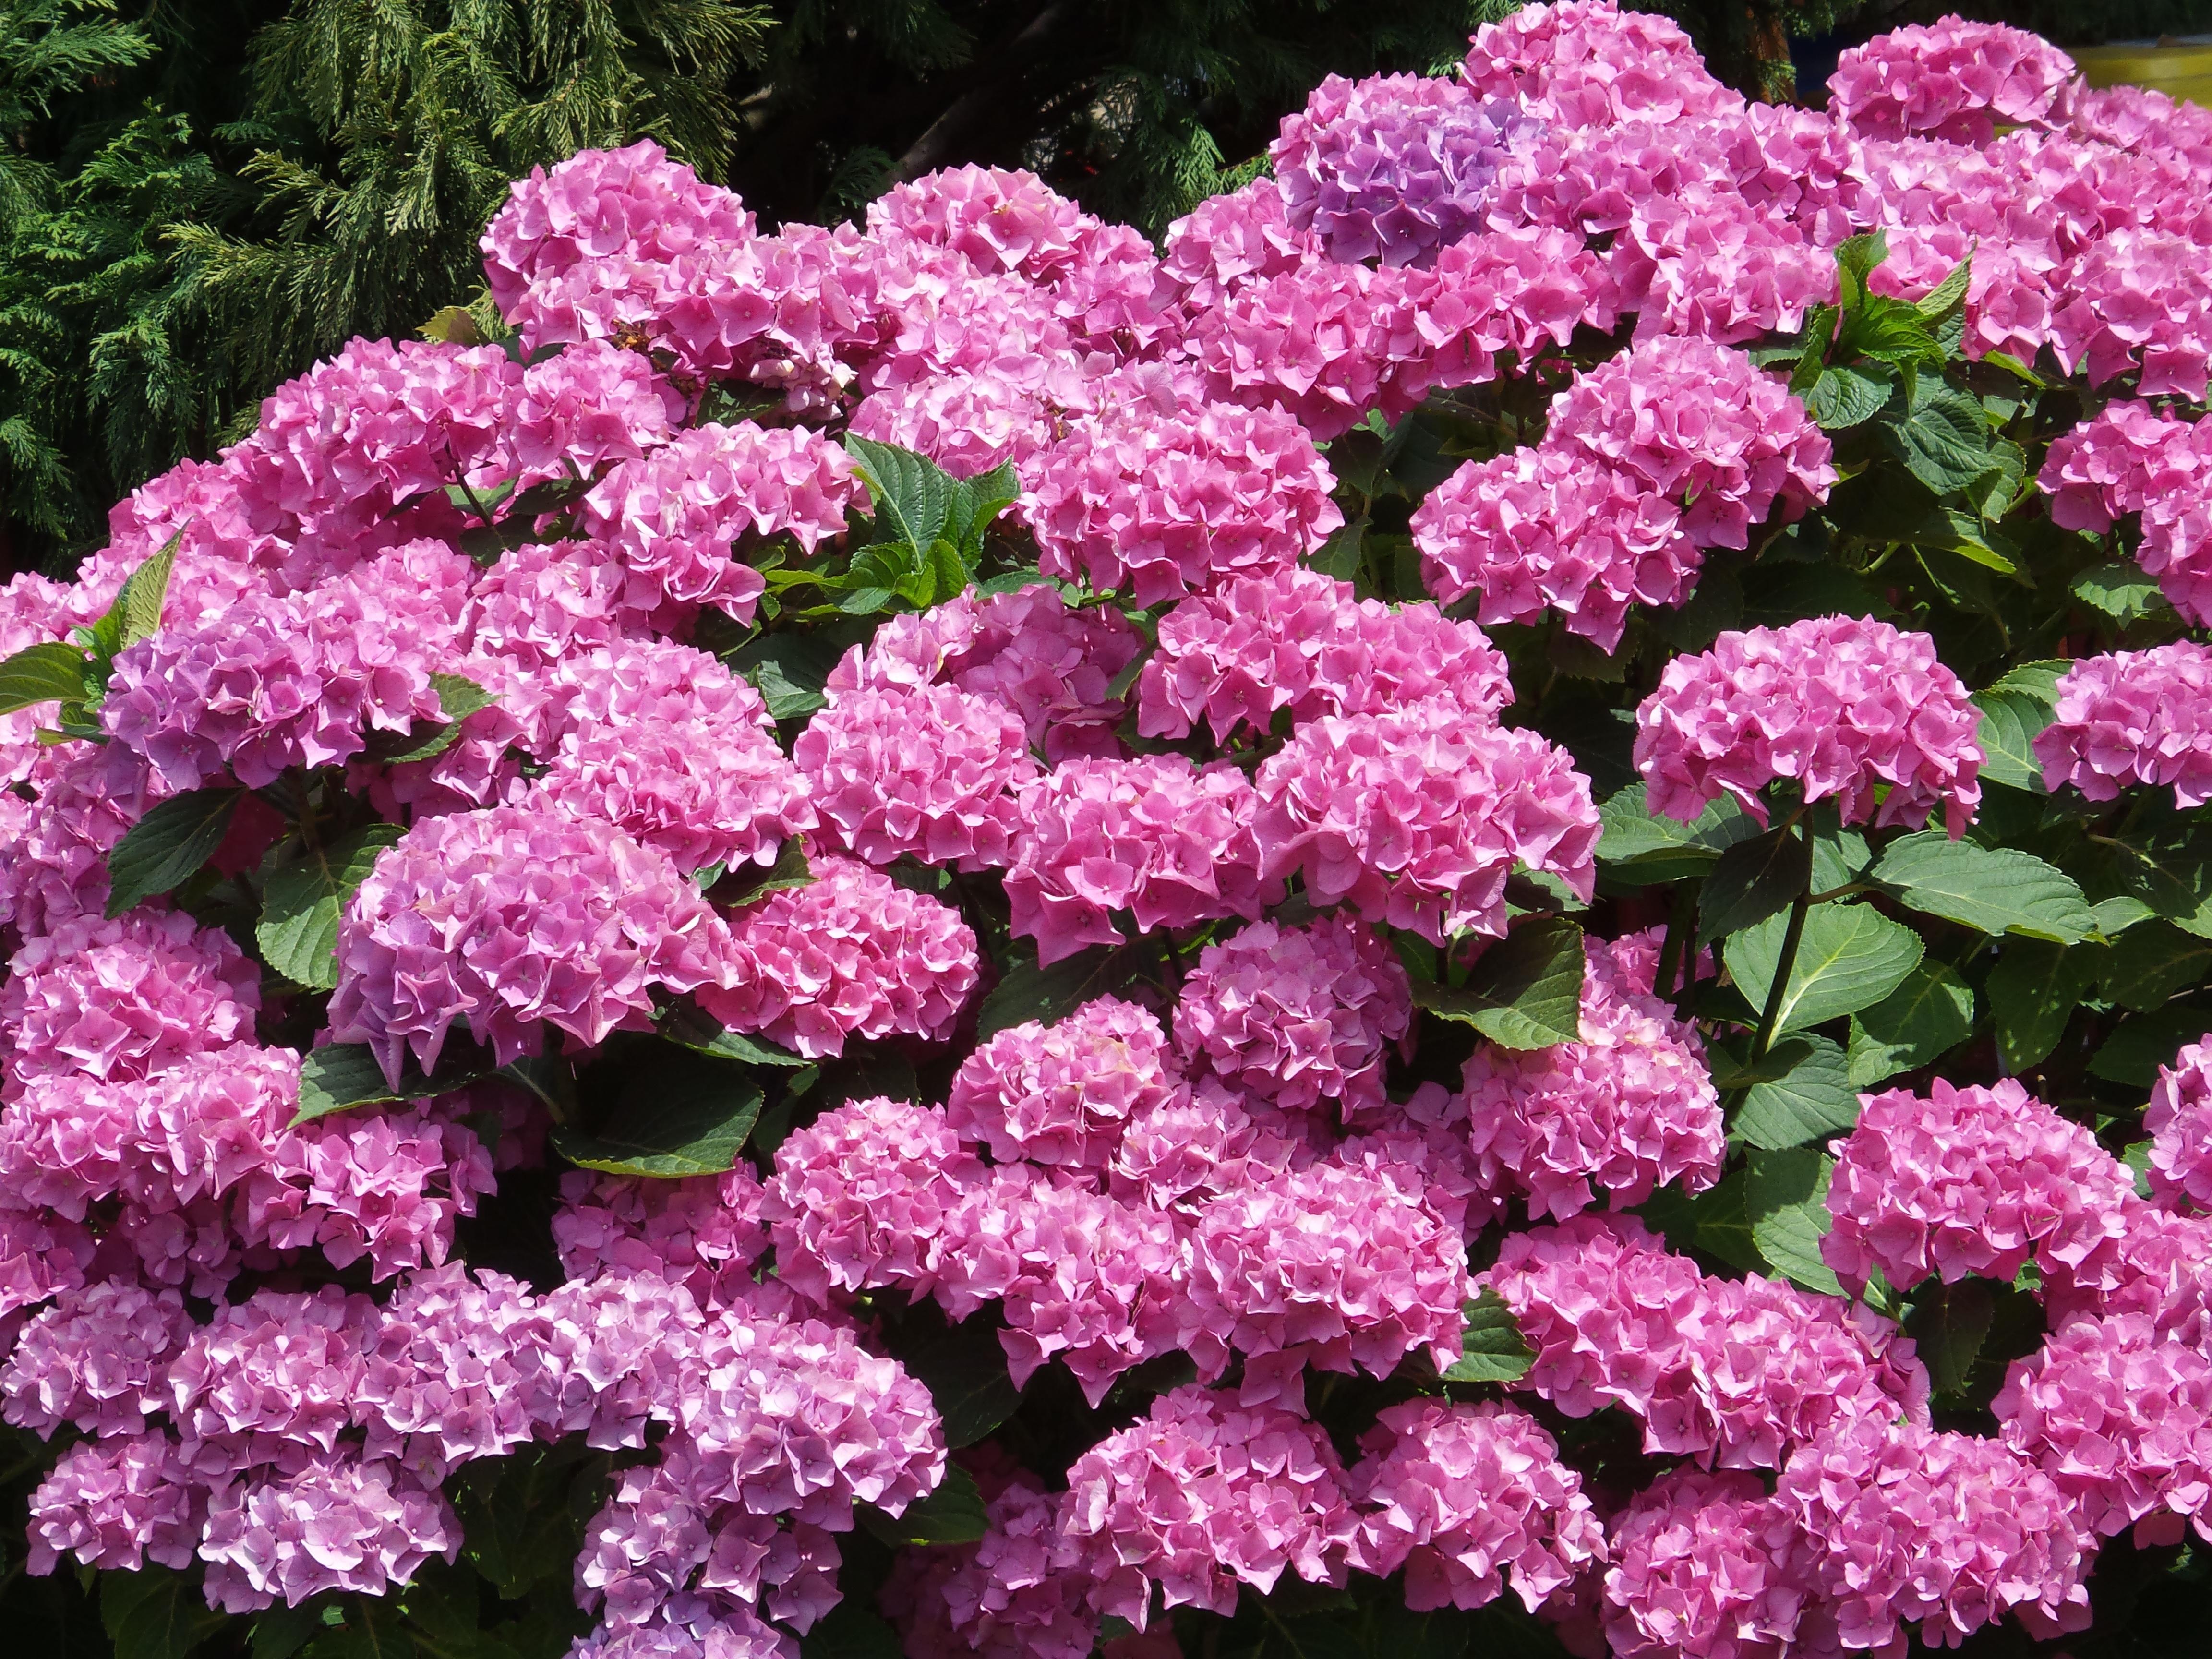 Free Images Nature Flower Petal Shrub Lilac Flowering Plant